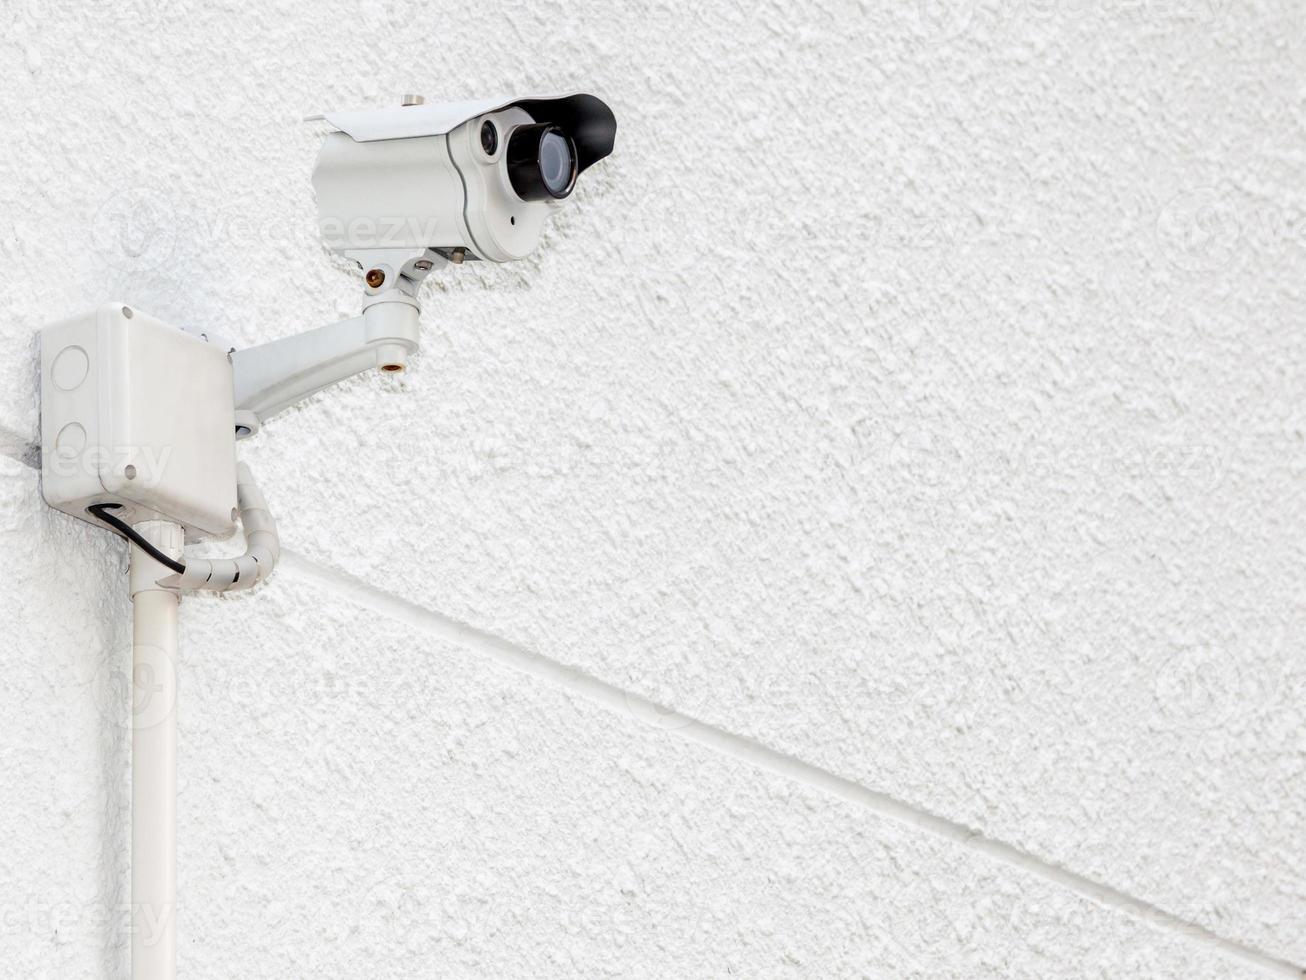 bewakingscamera, cctv op de witte cementmuur foto